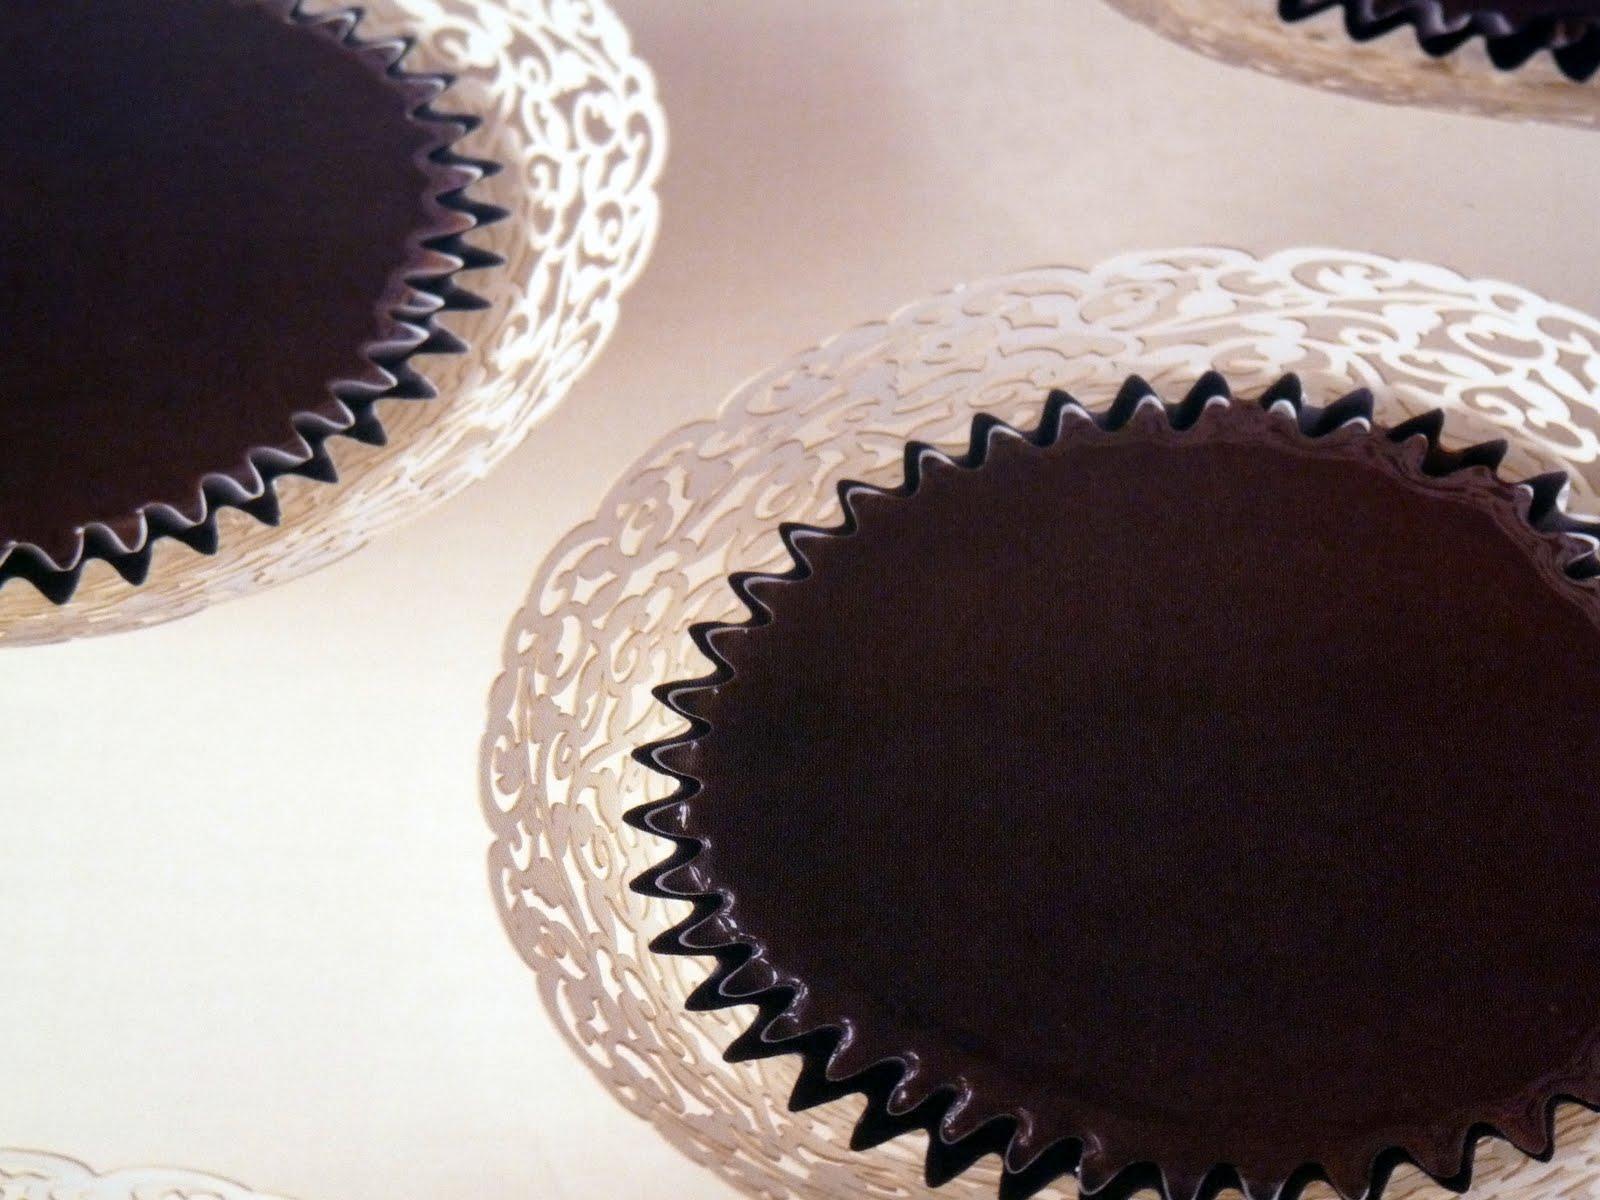 Rose Levy Beranbaum Chocolate Butter Cake Review